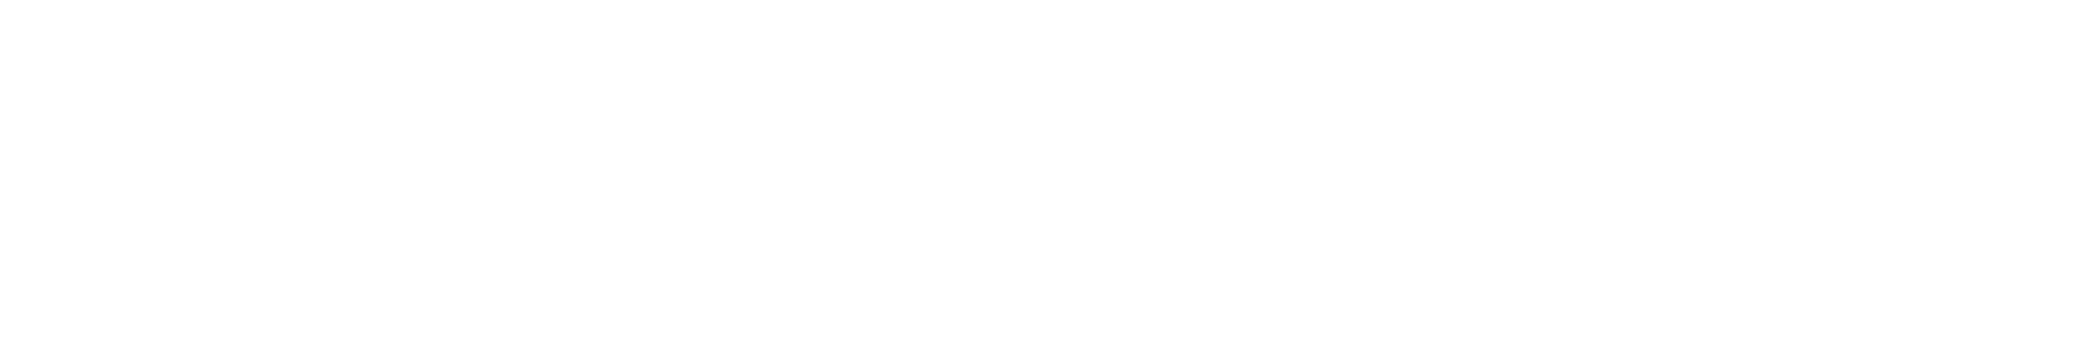 iTrading - Algorithmic Trading, Lua Scripting, Advanced